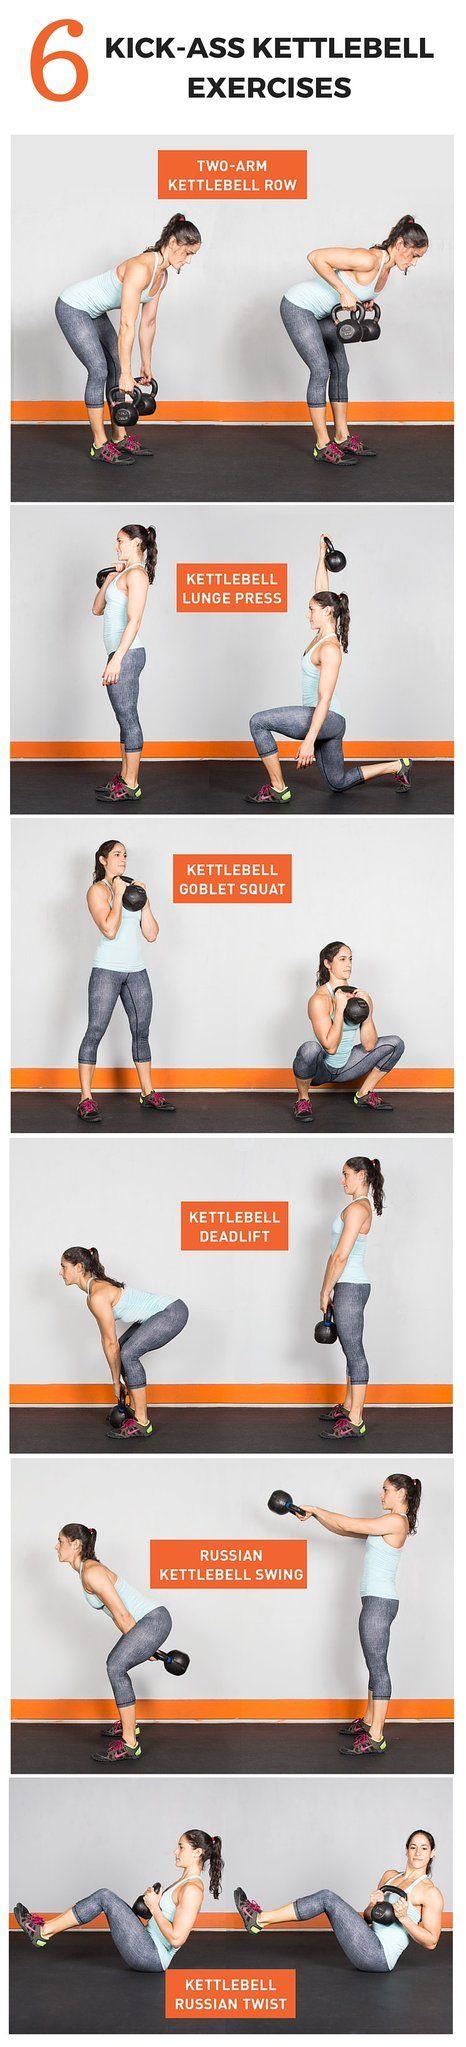 "Andreea- DailyFitHit on Twitter: ""Kick-Ass Kettlebell Workout https://t.co/UkX8REHDPQ #KettlebellWorkout https://t.co/65lzB9EpB8"""